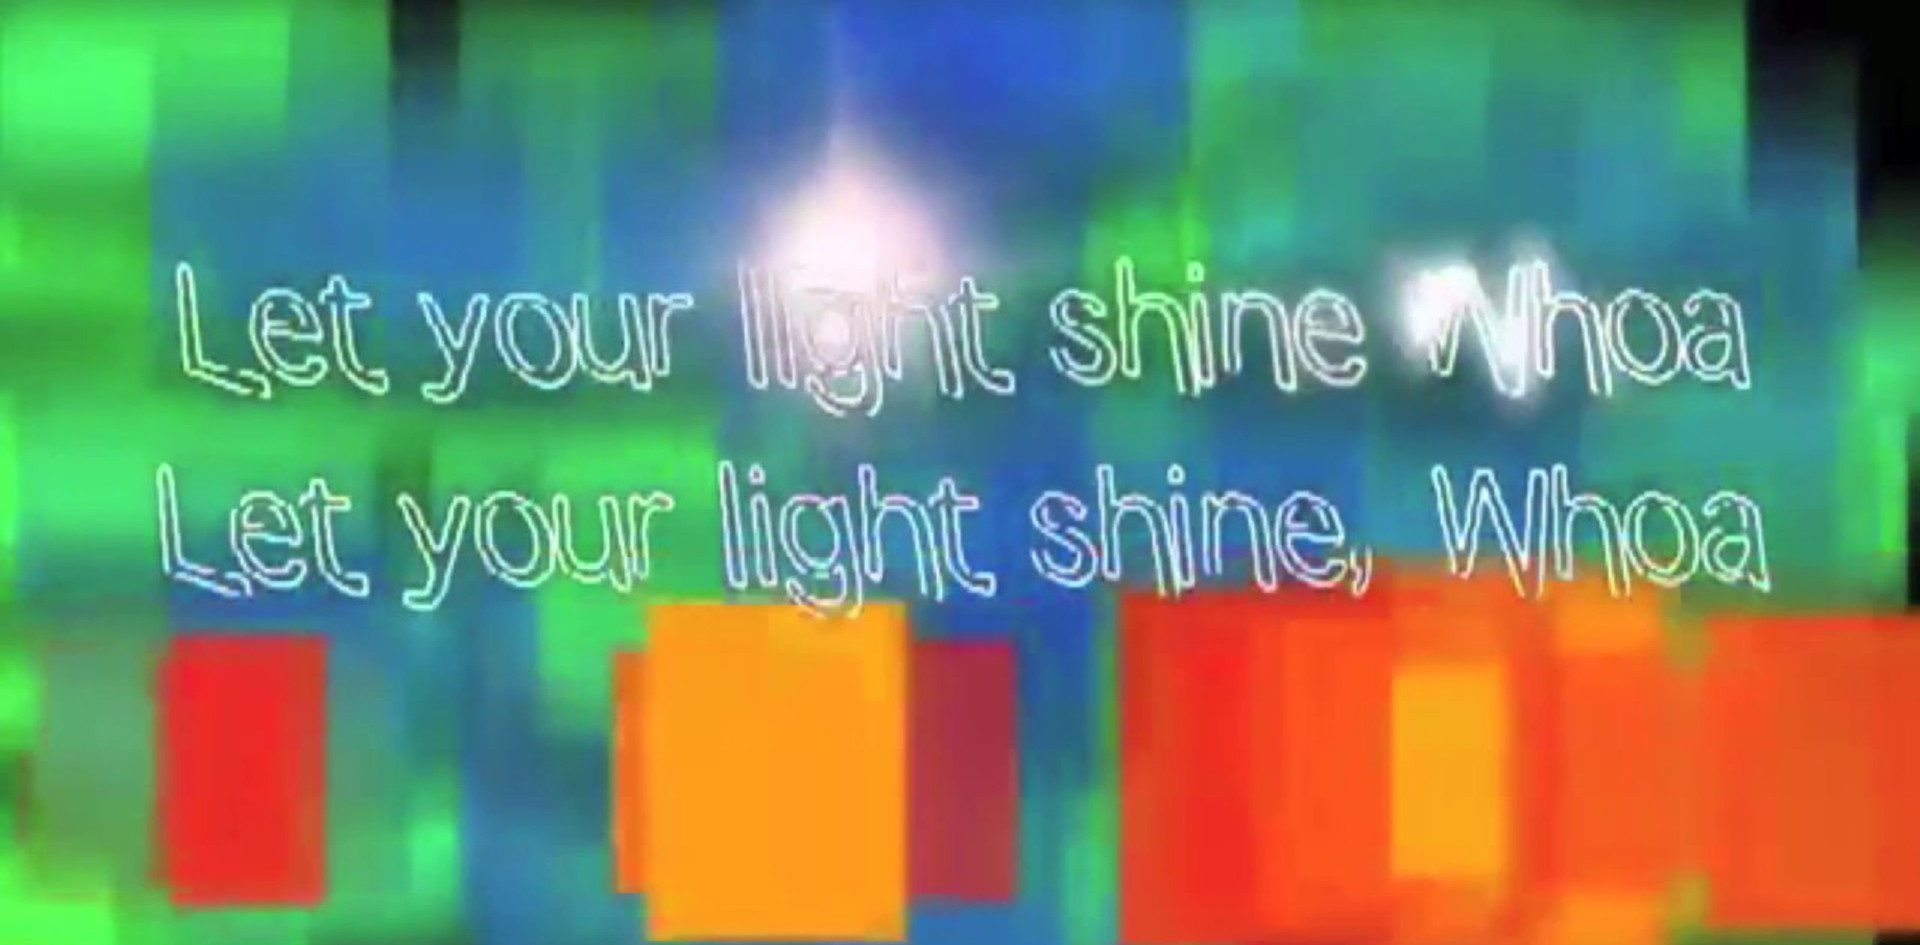 Let Your Light Shine Lyric Video